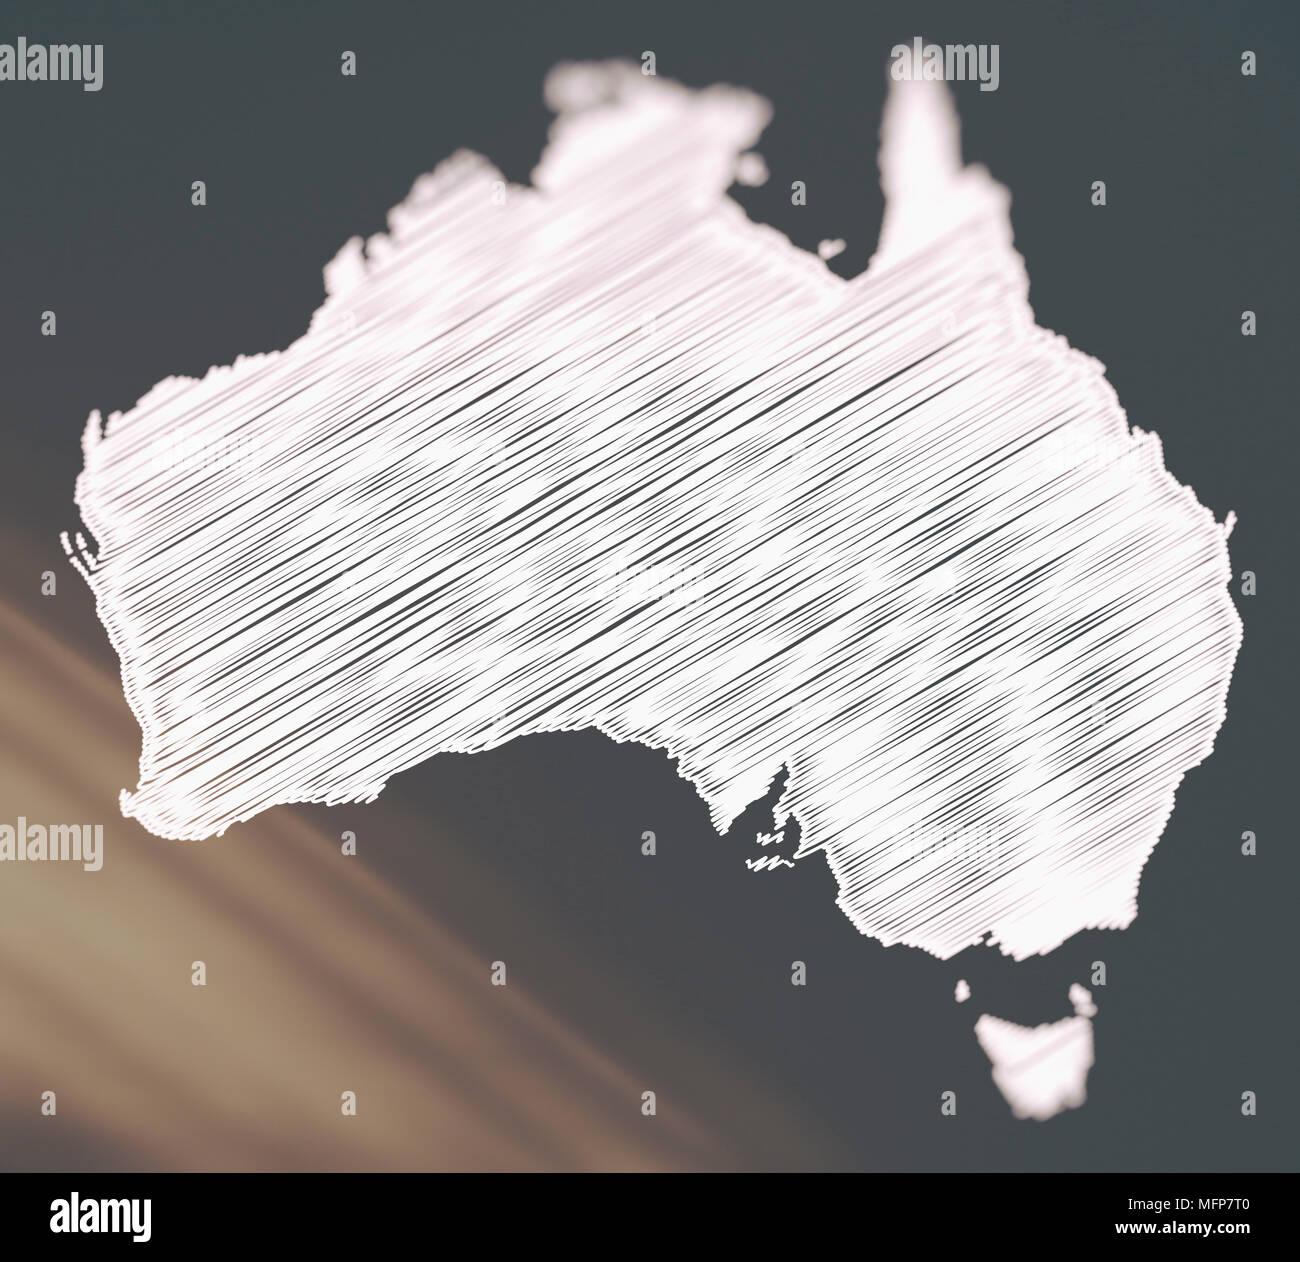 Creative blurred scribble map illustration of Australia - Stock Image